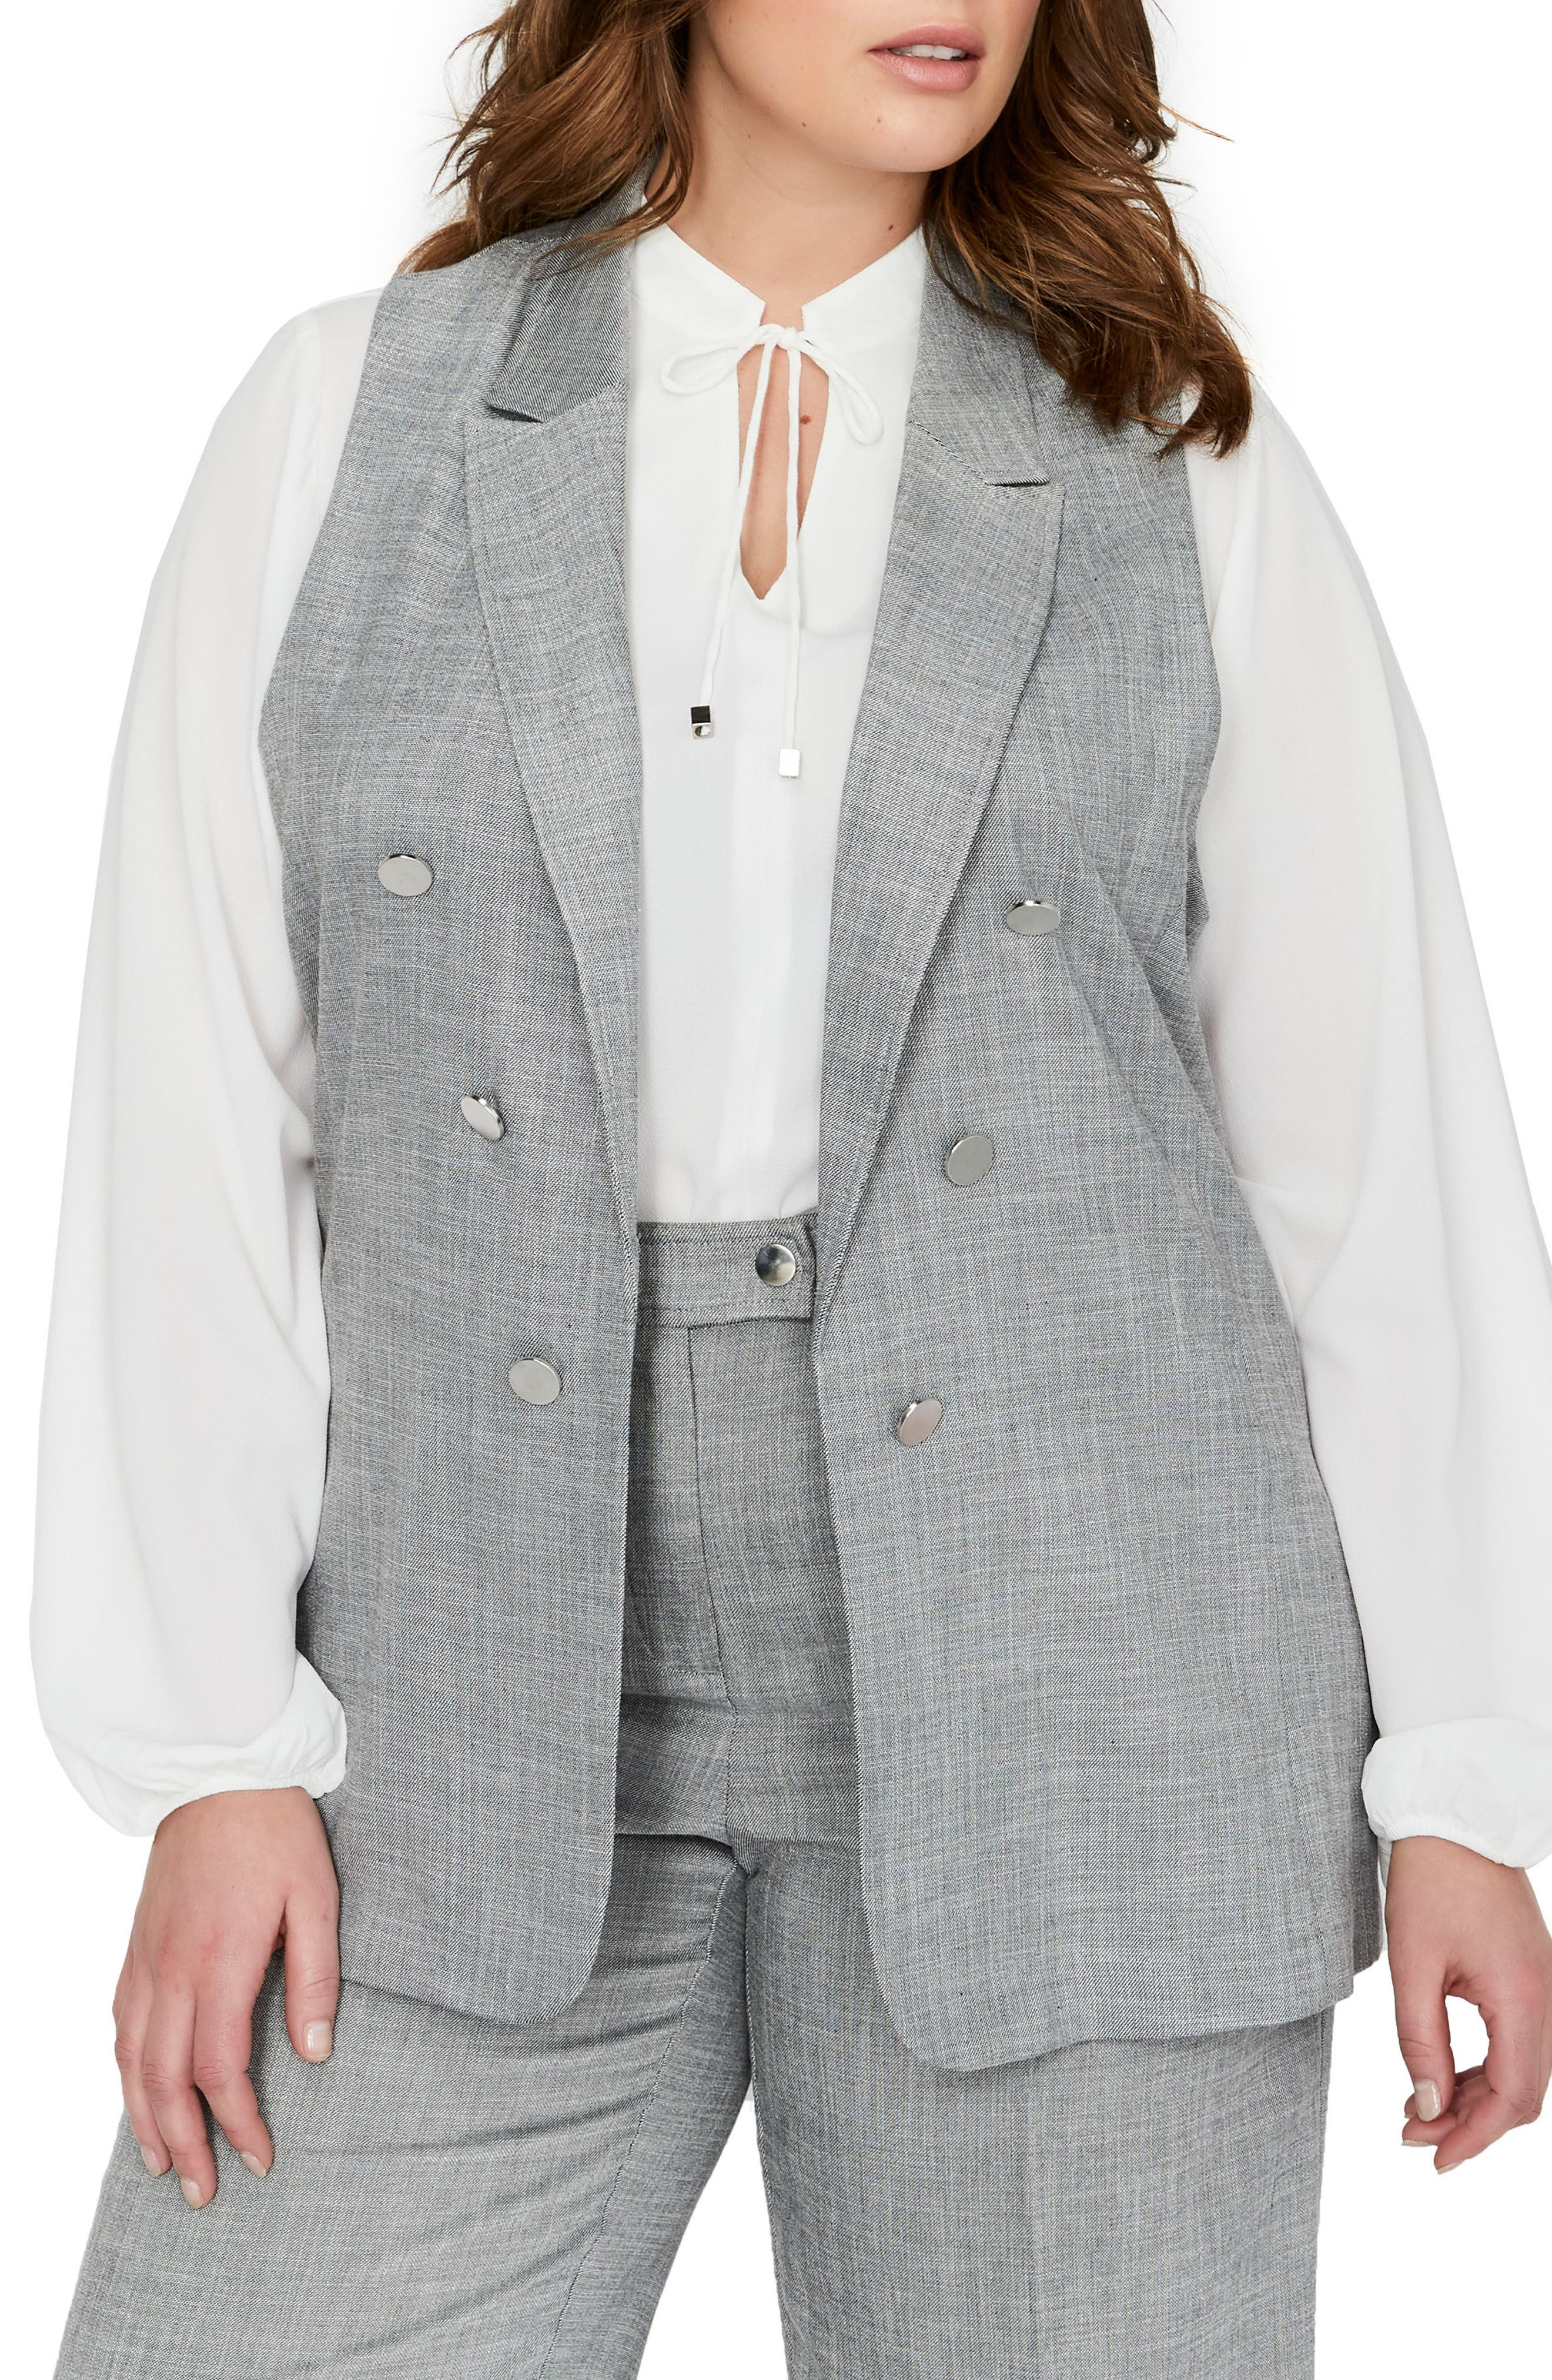 Peak Collar Vest,                             Main thumbnail 1, color,                             BLACK/ WHITE YARN DYE- SW